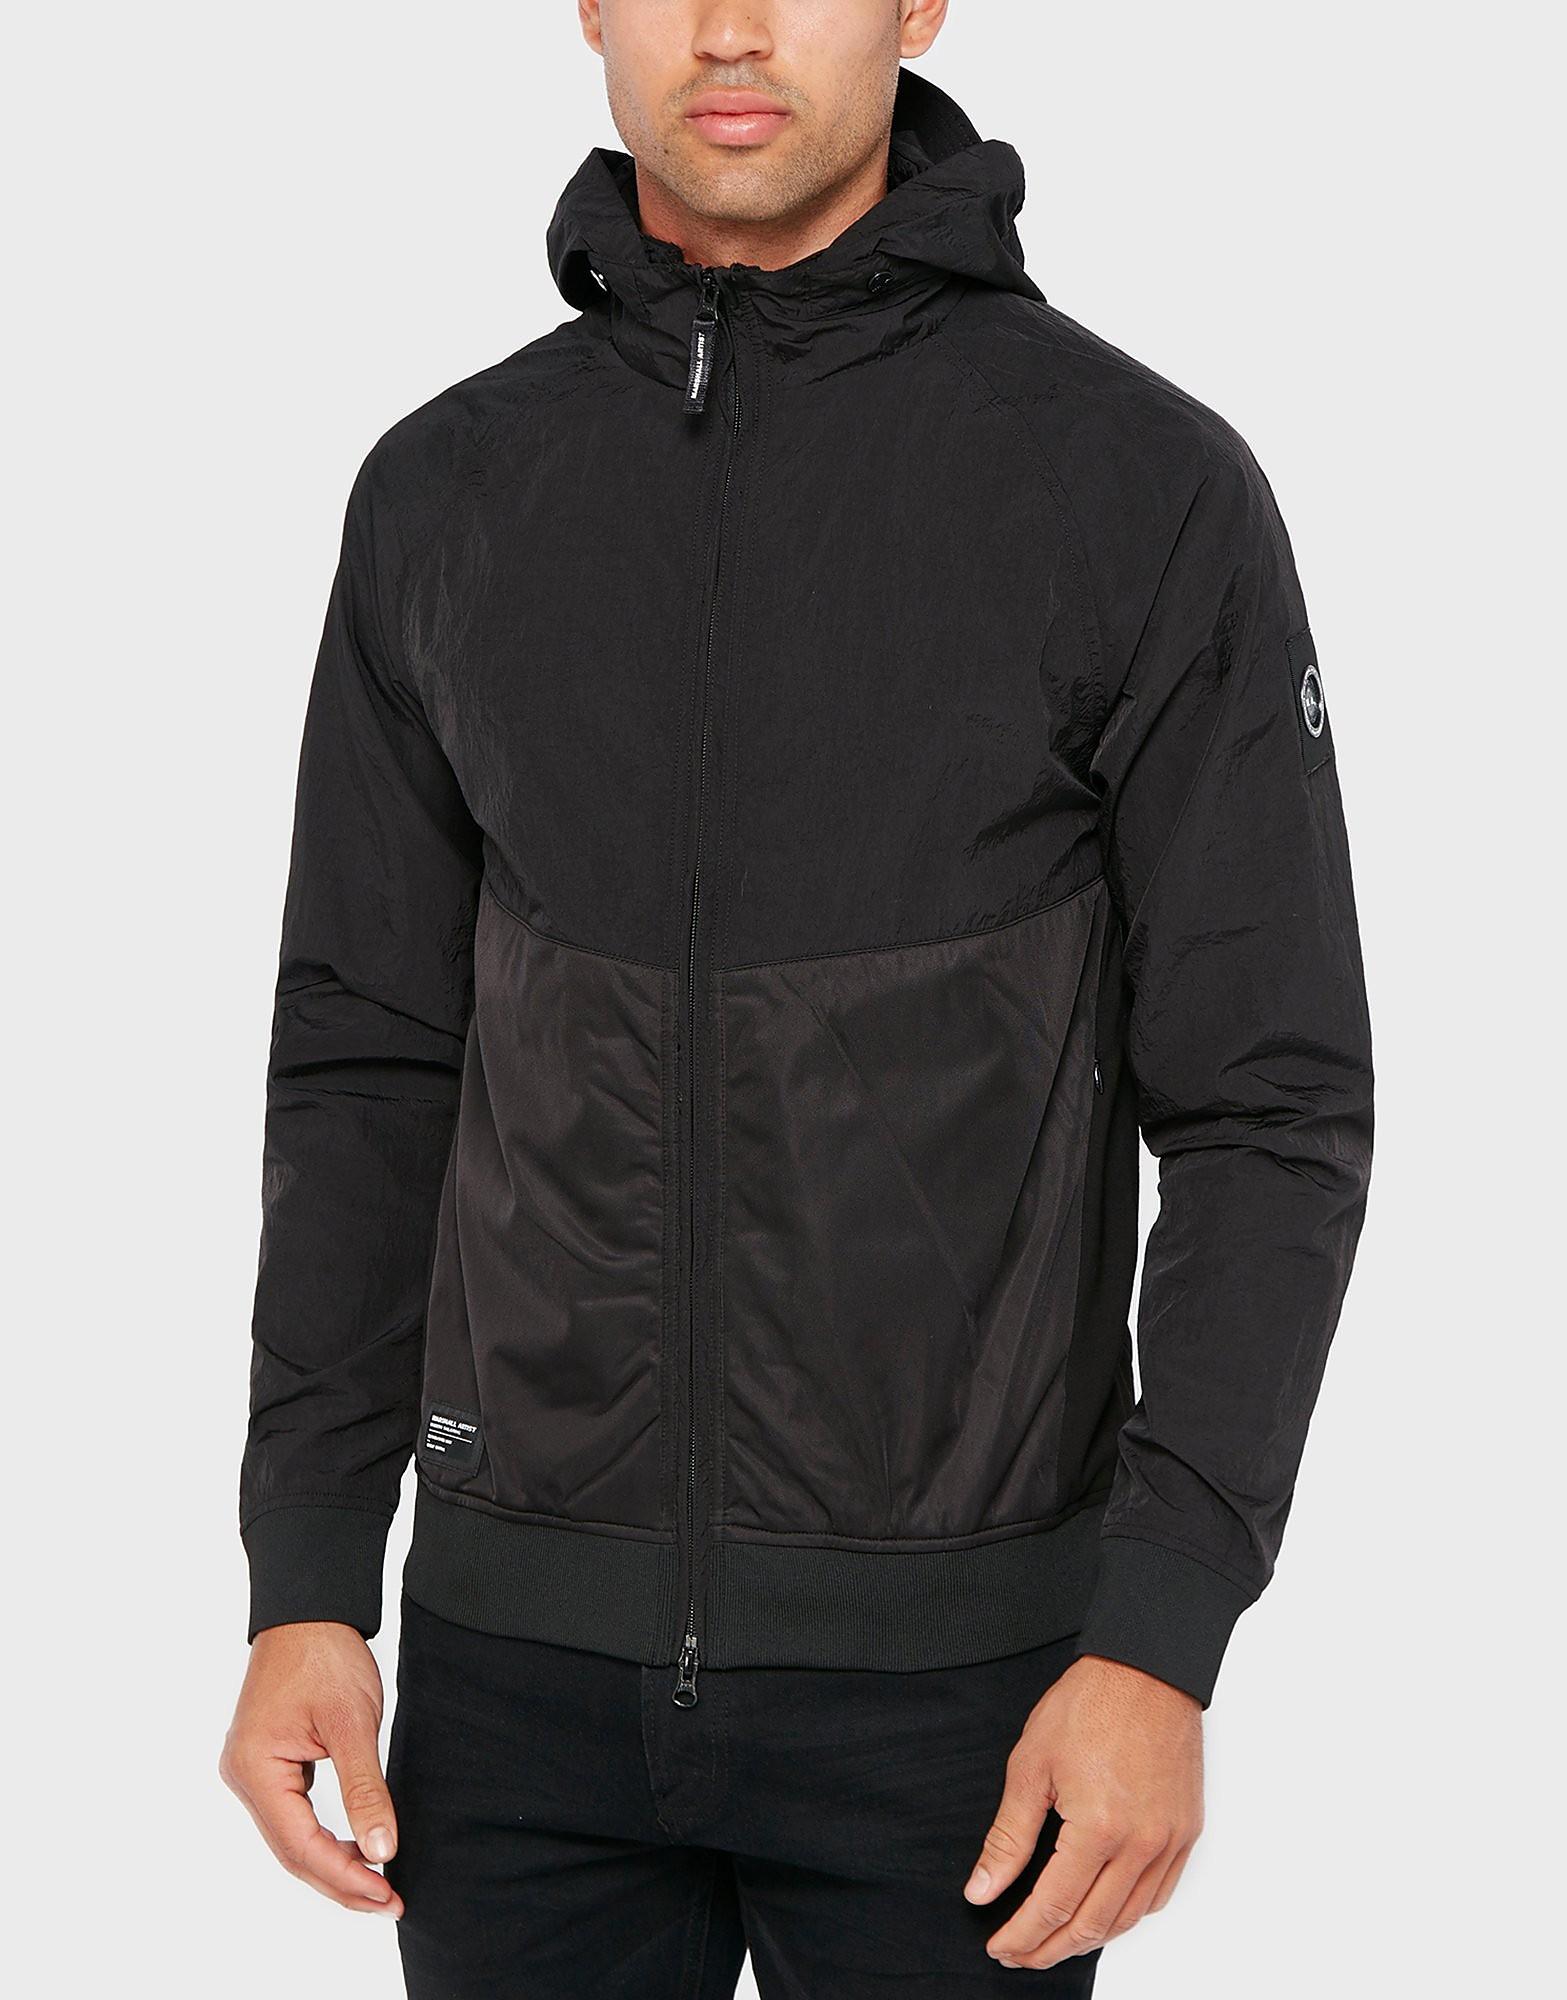 Marshall Artist Compacta Lightweight Jacket